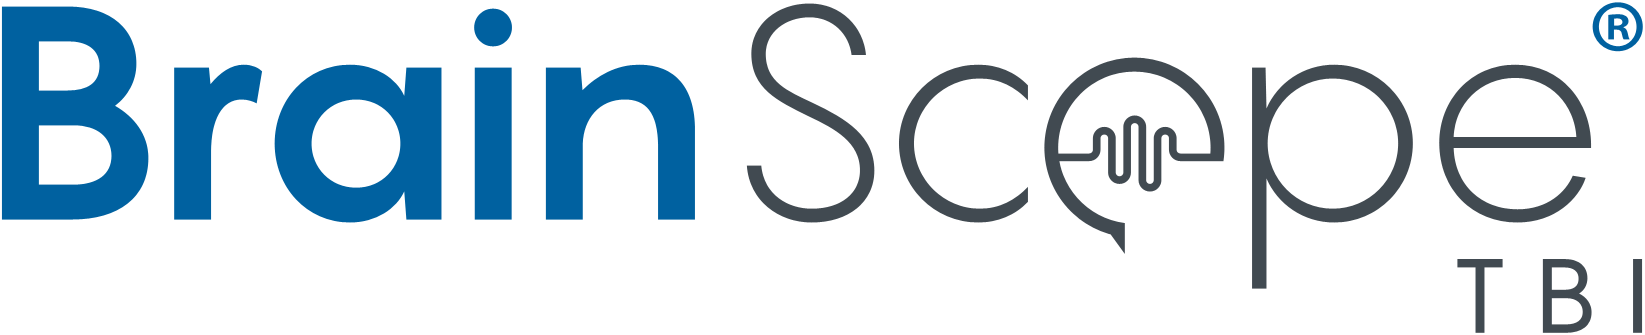 BrainScope needs a powerful Logo -Mild brain injury medical device